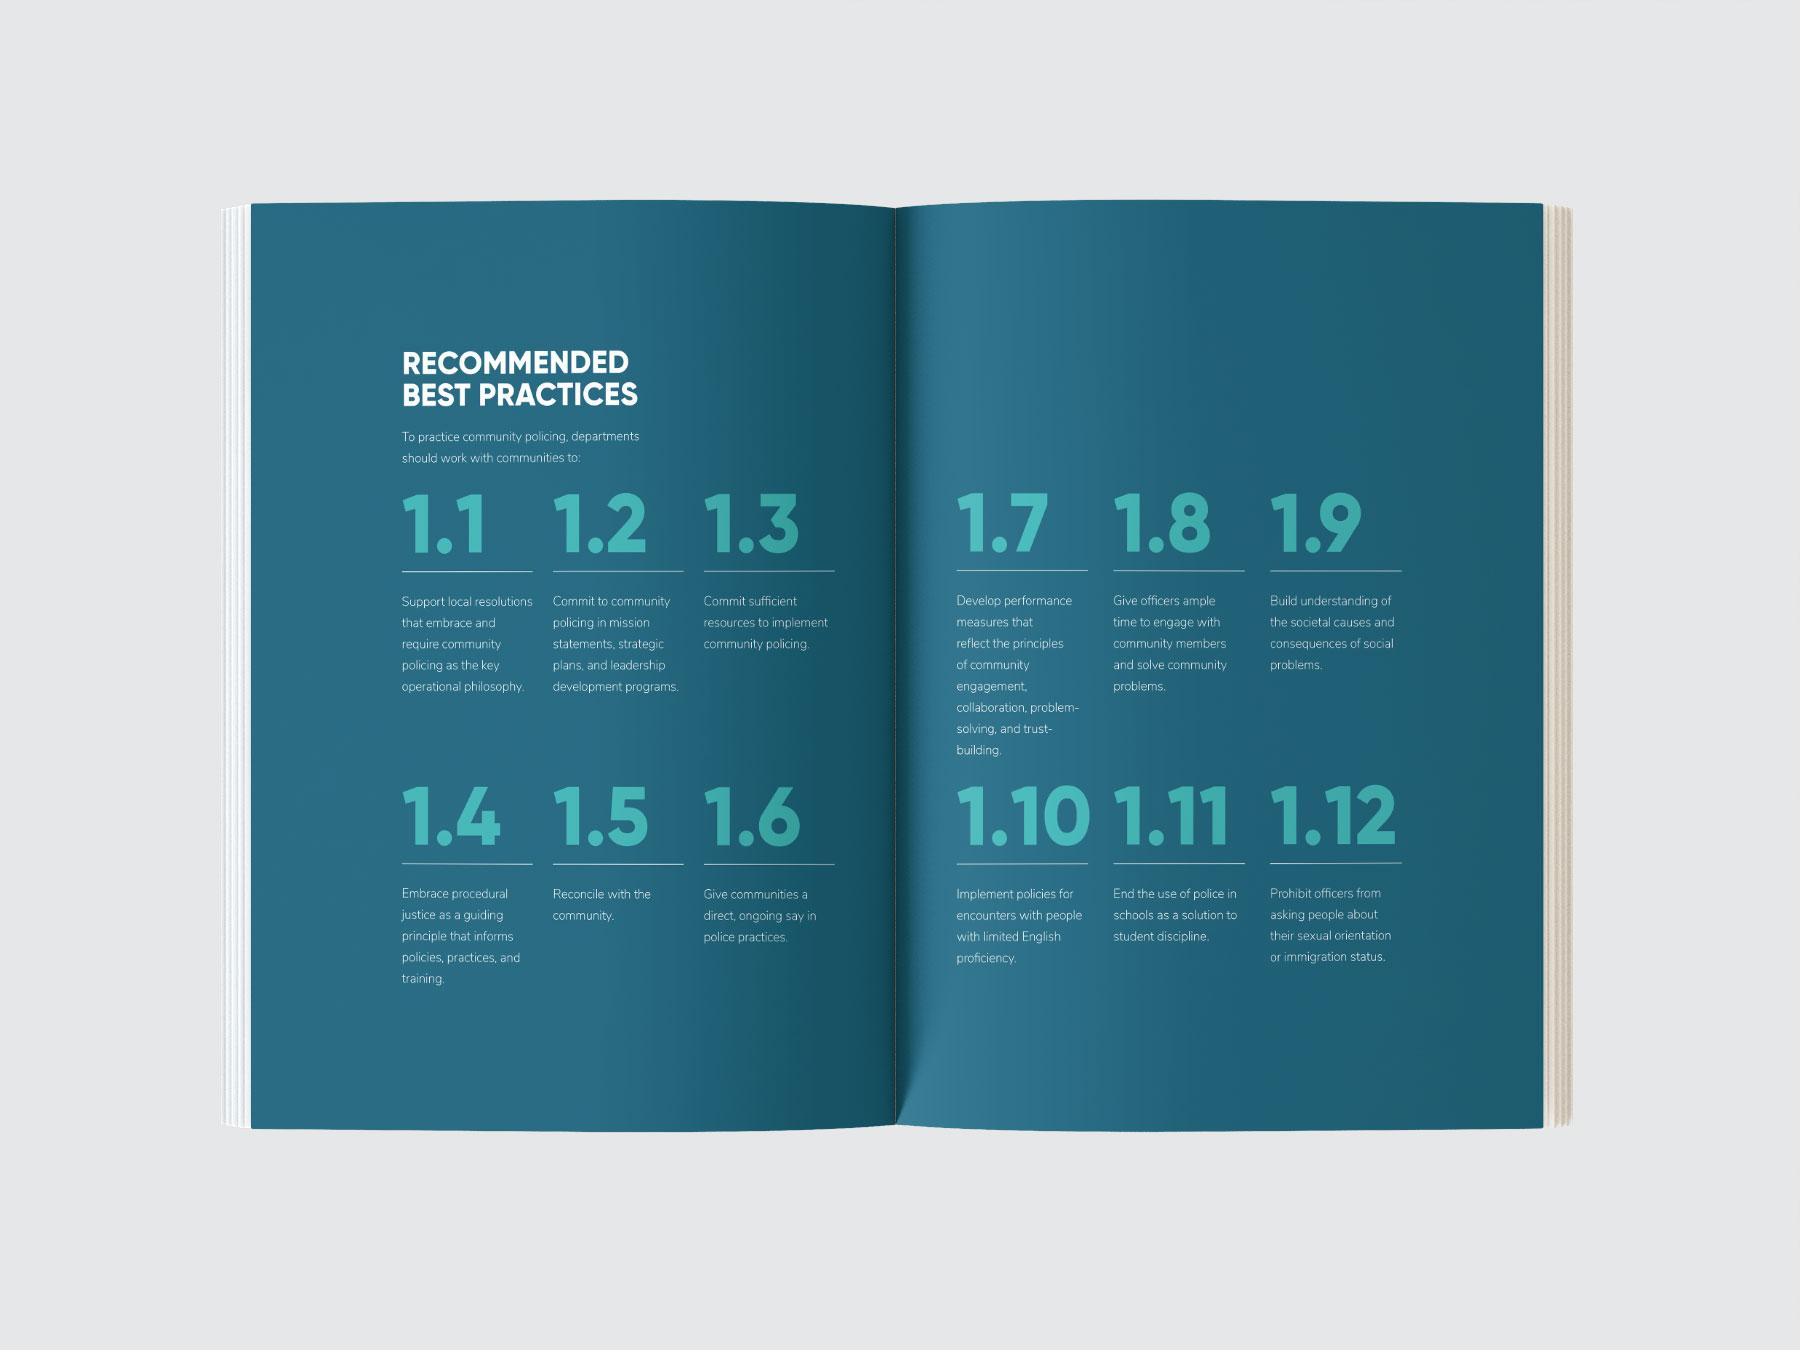 jasmin-plouffe-designer-graphic-design-19.jpg